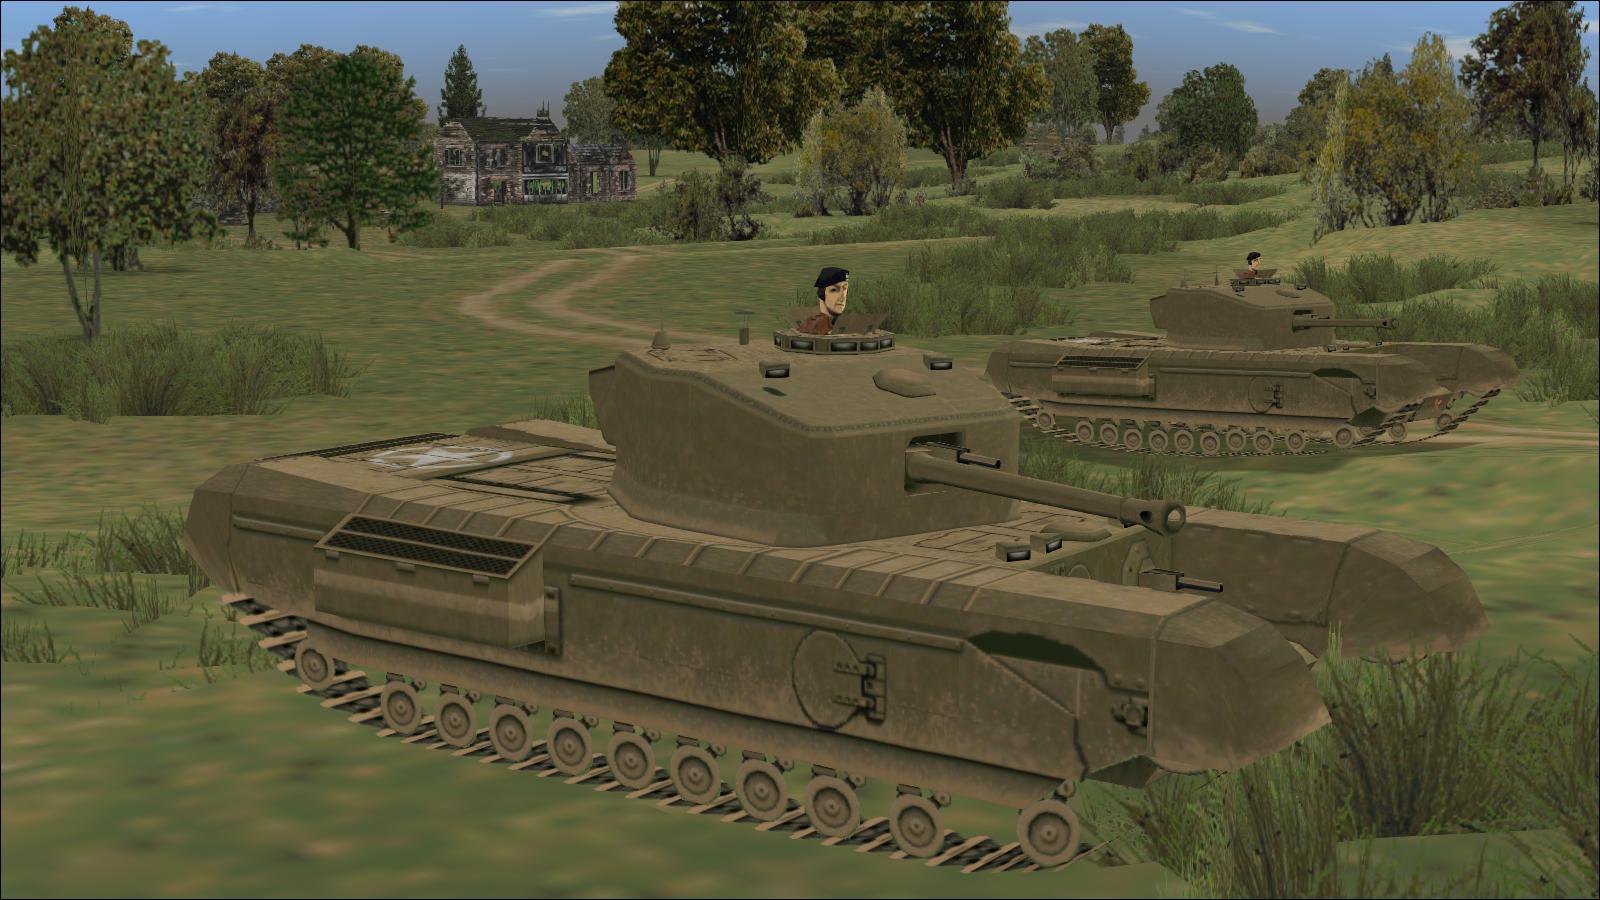 Panzer Elite - Brit44-x beta - South of Hill 112 - Churchill VIIs, 3 Troop, 'C' Squadron, 107 Regt RAC